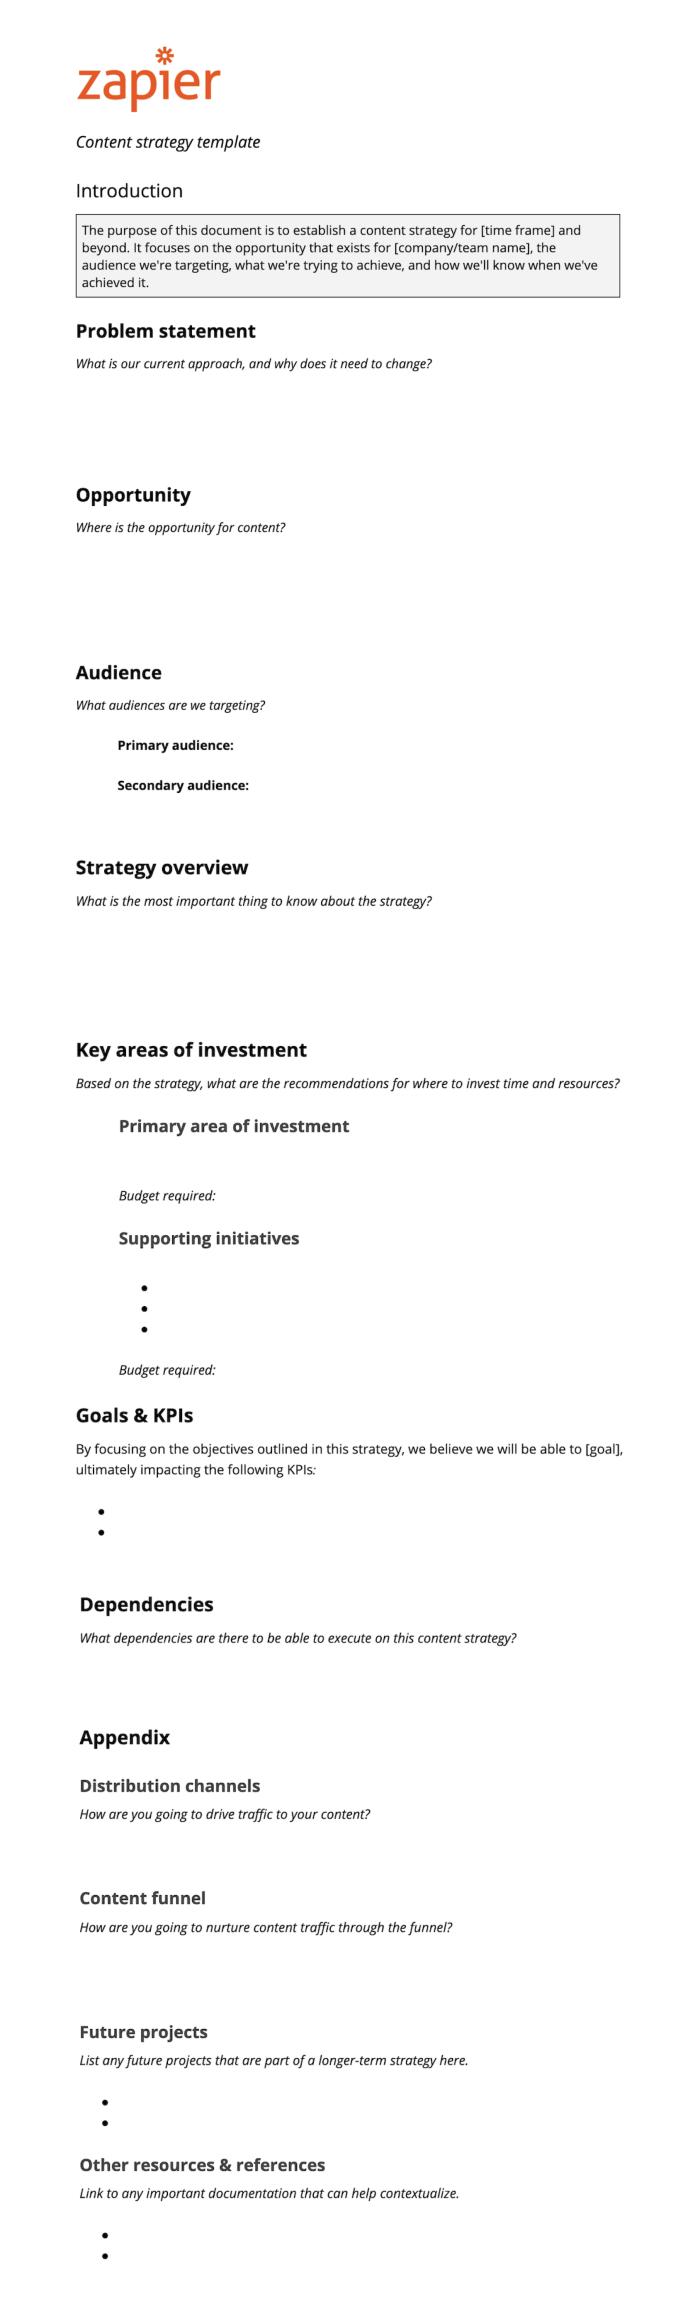 Zapier's content marketing strategy template